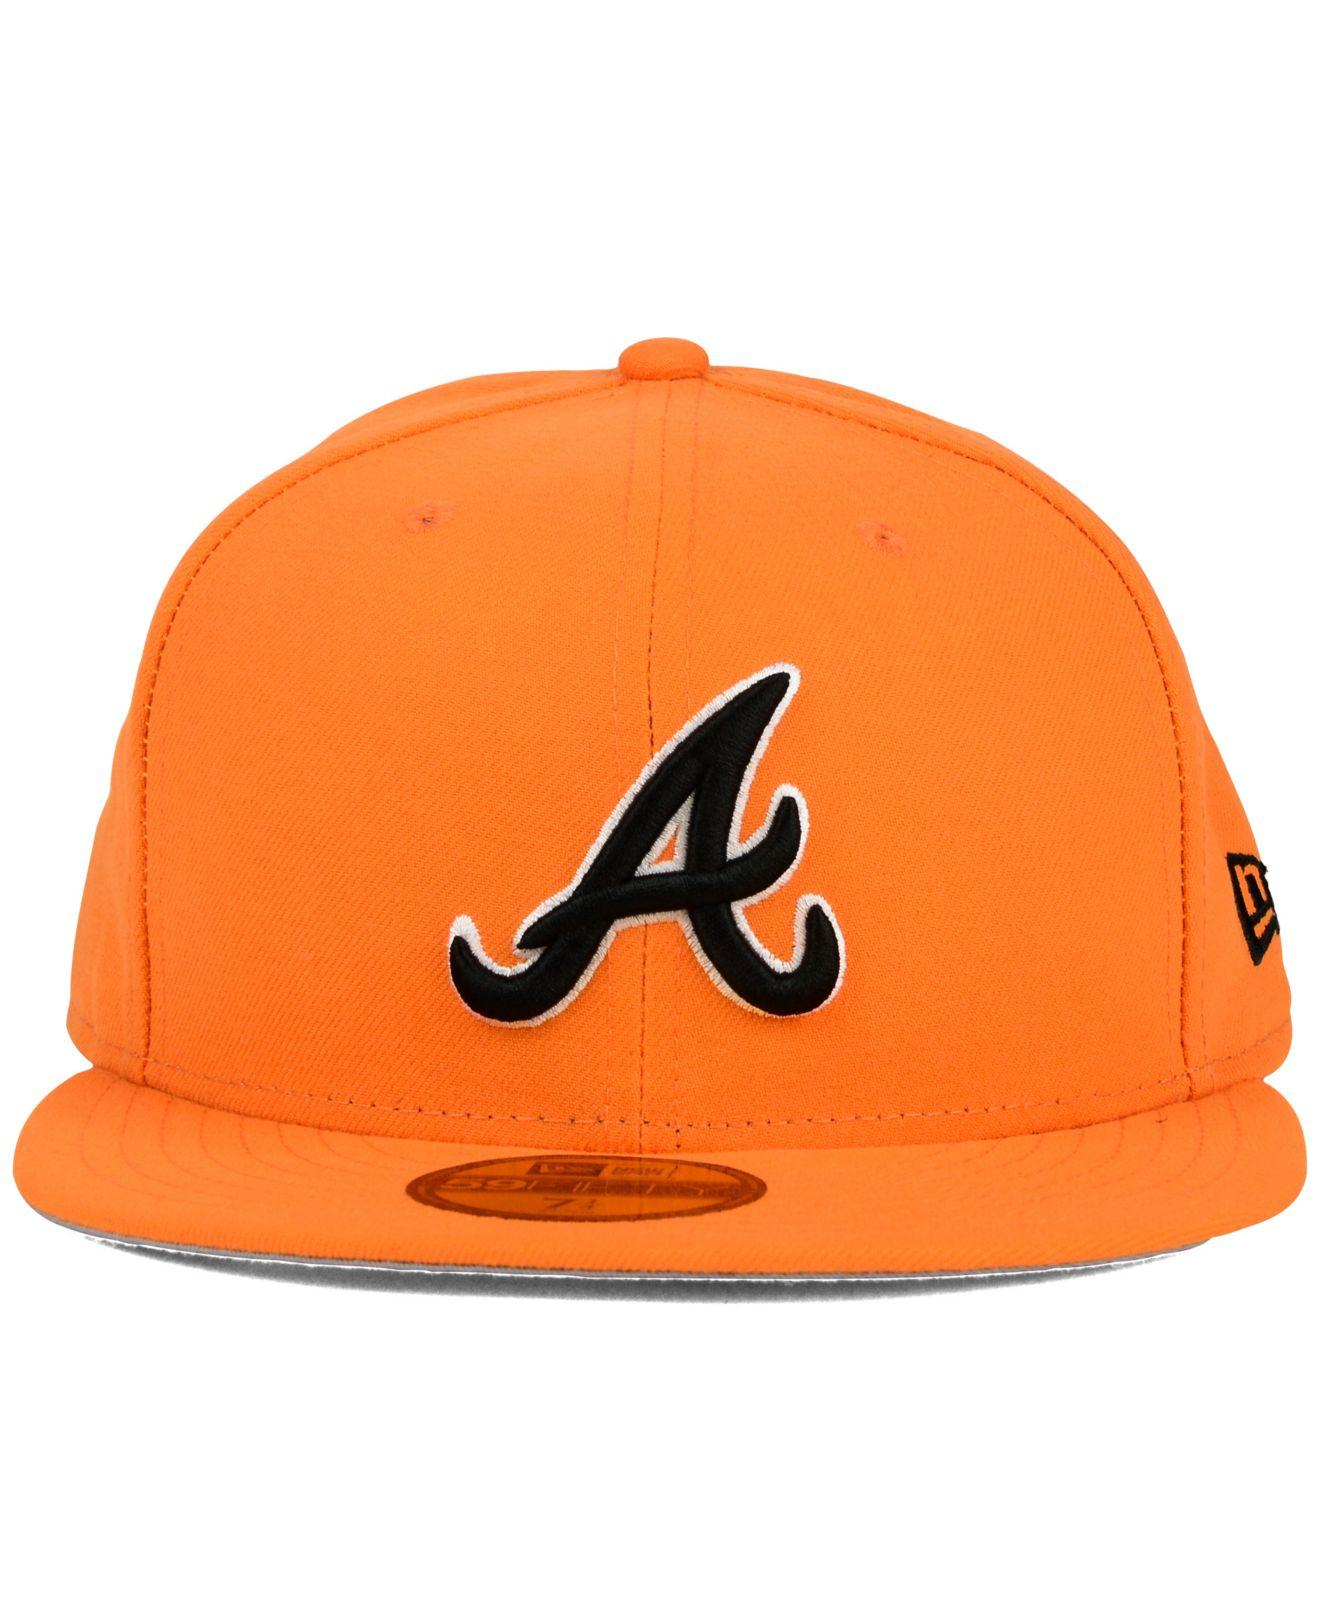 6d6ddeb4531324 ... purchase lyst ktz atlanta braves c dub 59fifty cap in orange for men  61b31 2c558